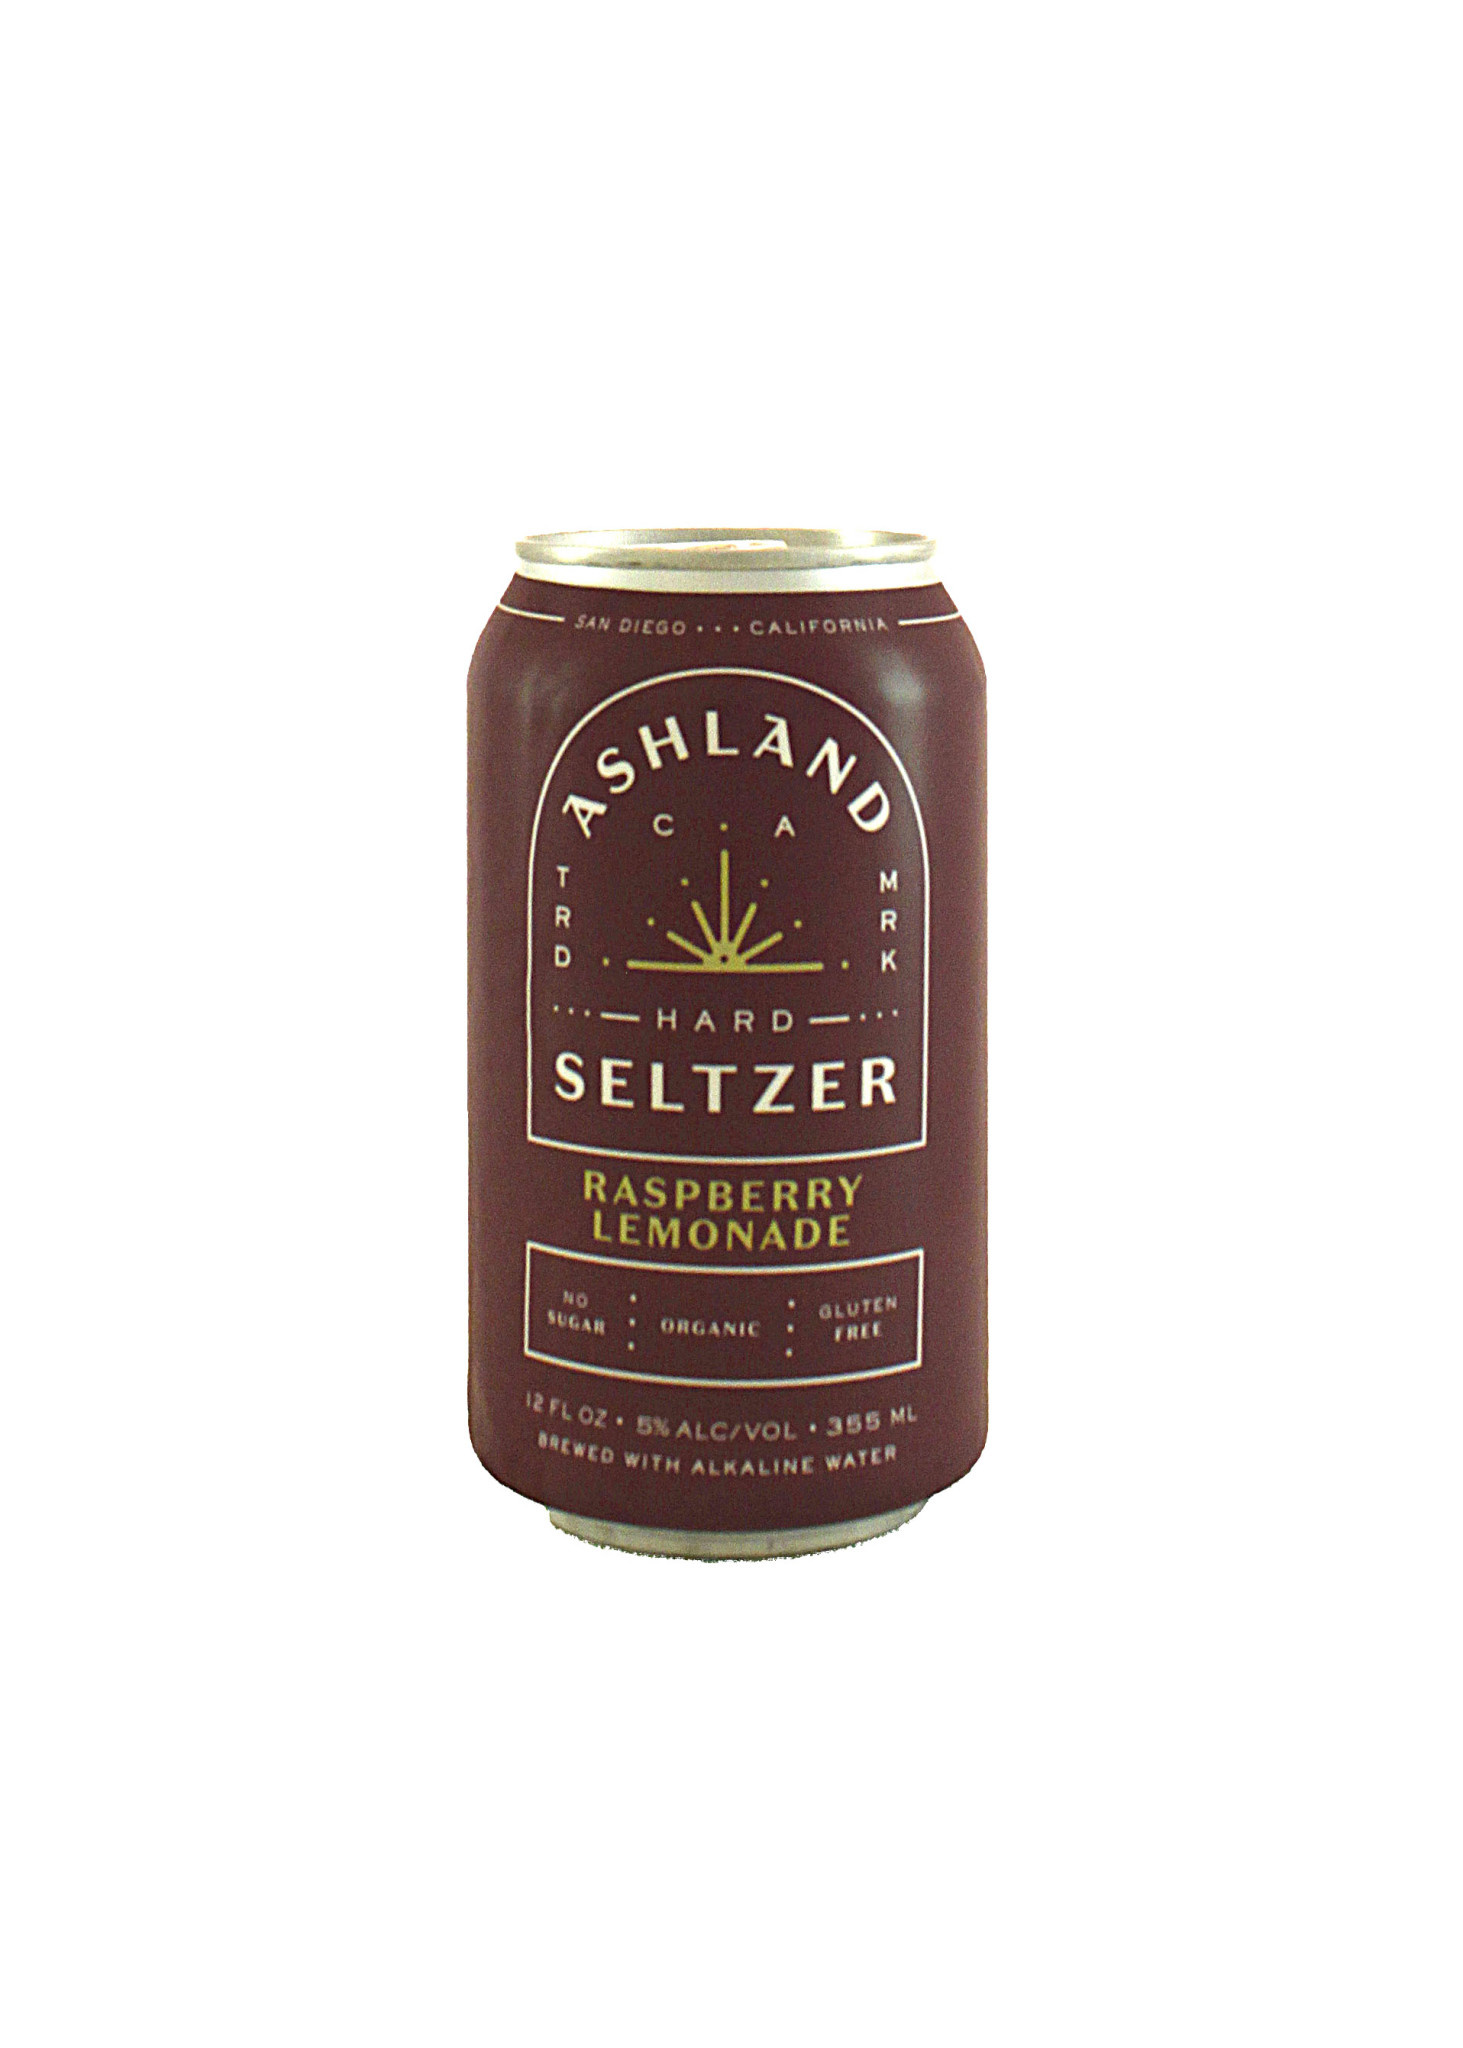 Ashland Hard Seltzer Raspberry Lemonade, Organic 12oz. Can - San Diego, CA